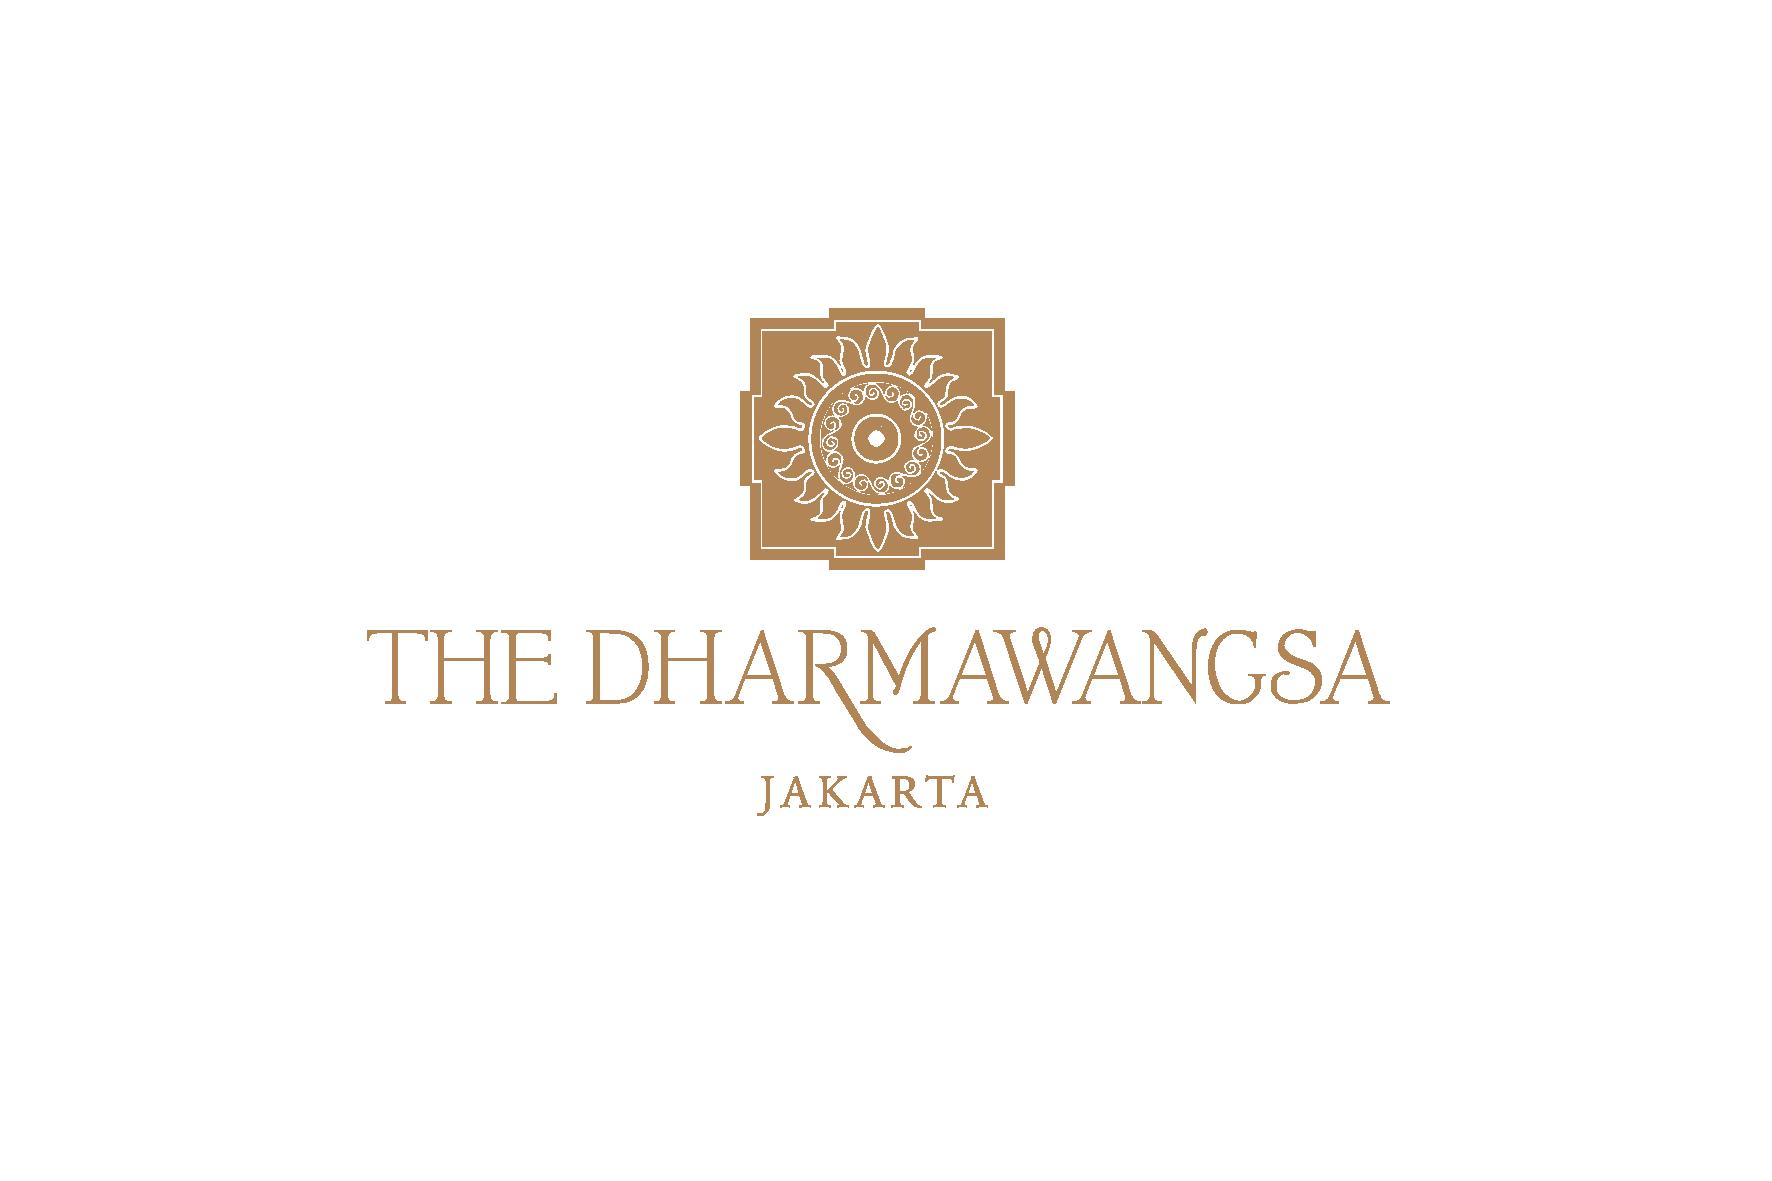 The Dharmawangsa